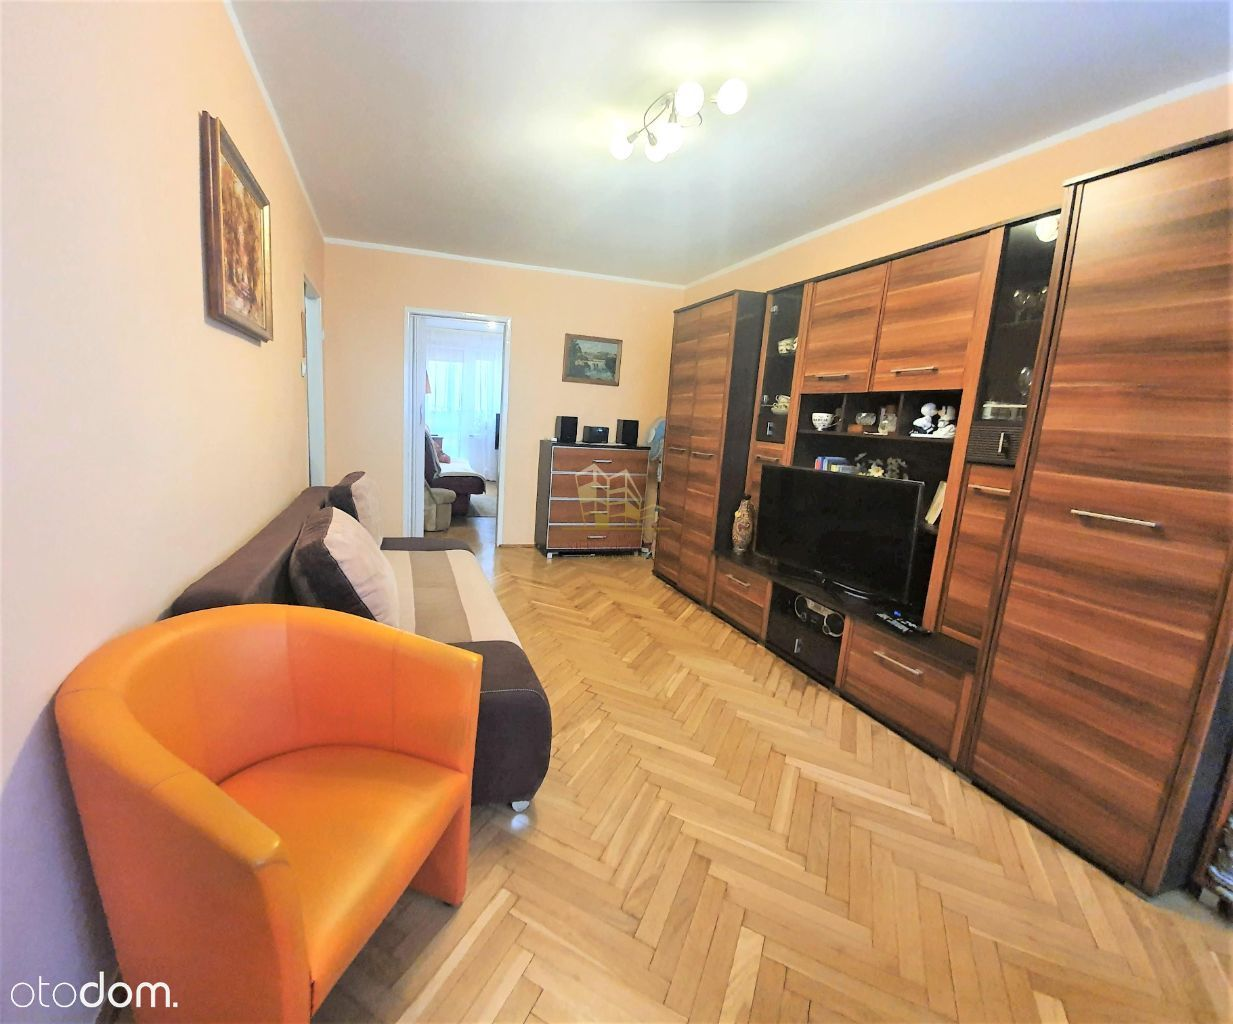 Mieszkanie 2 pok./ 39.6 m2/Parter/ Bielawa!